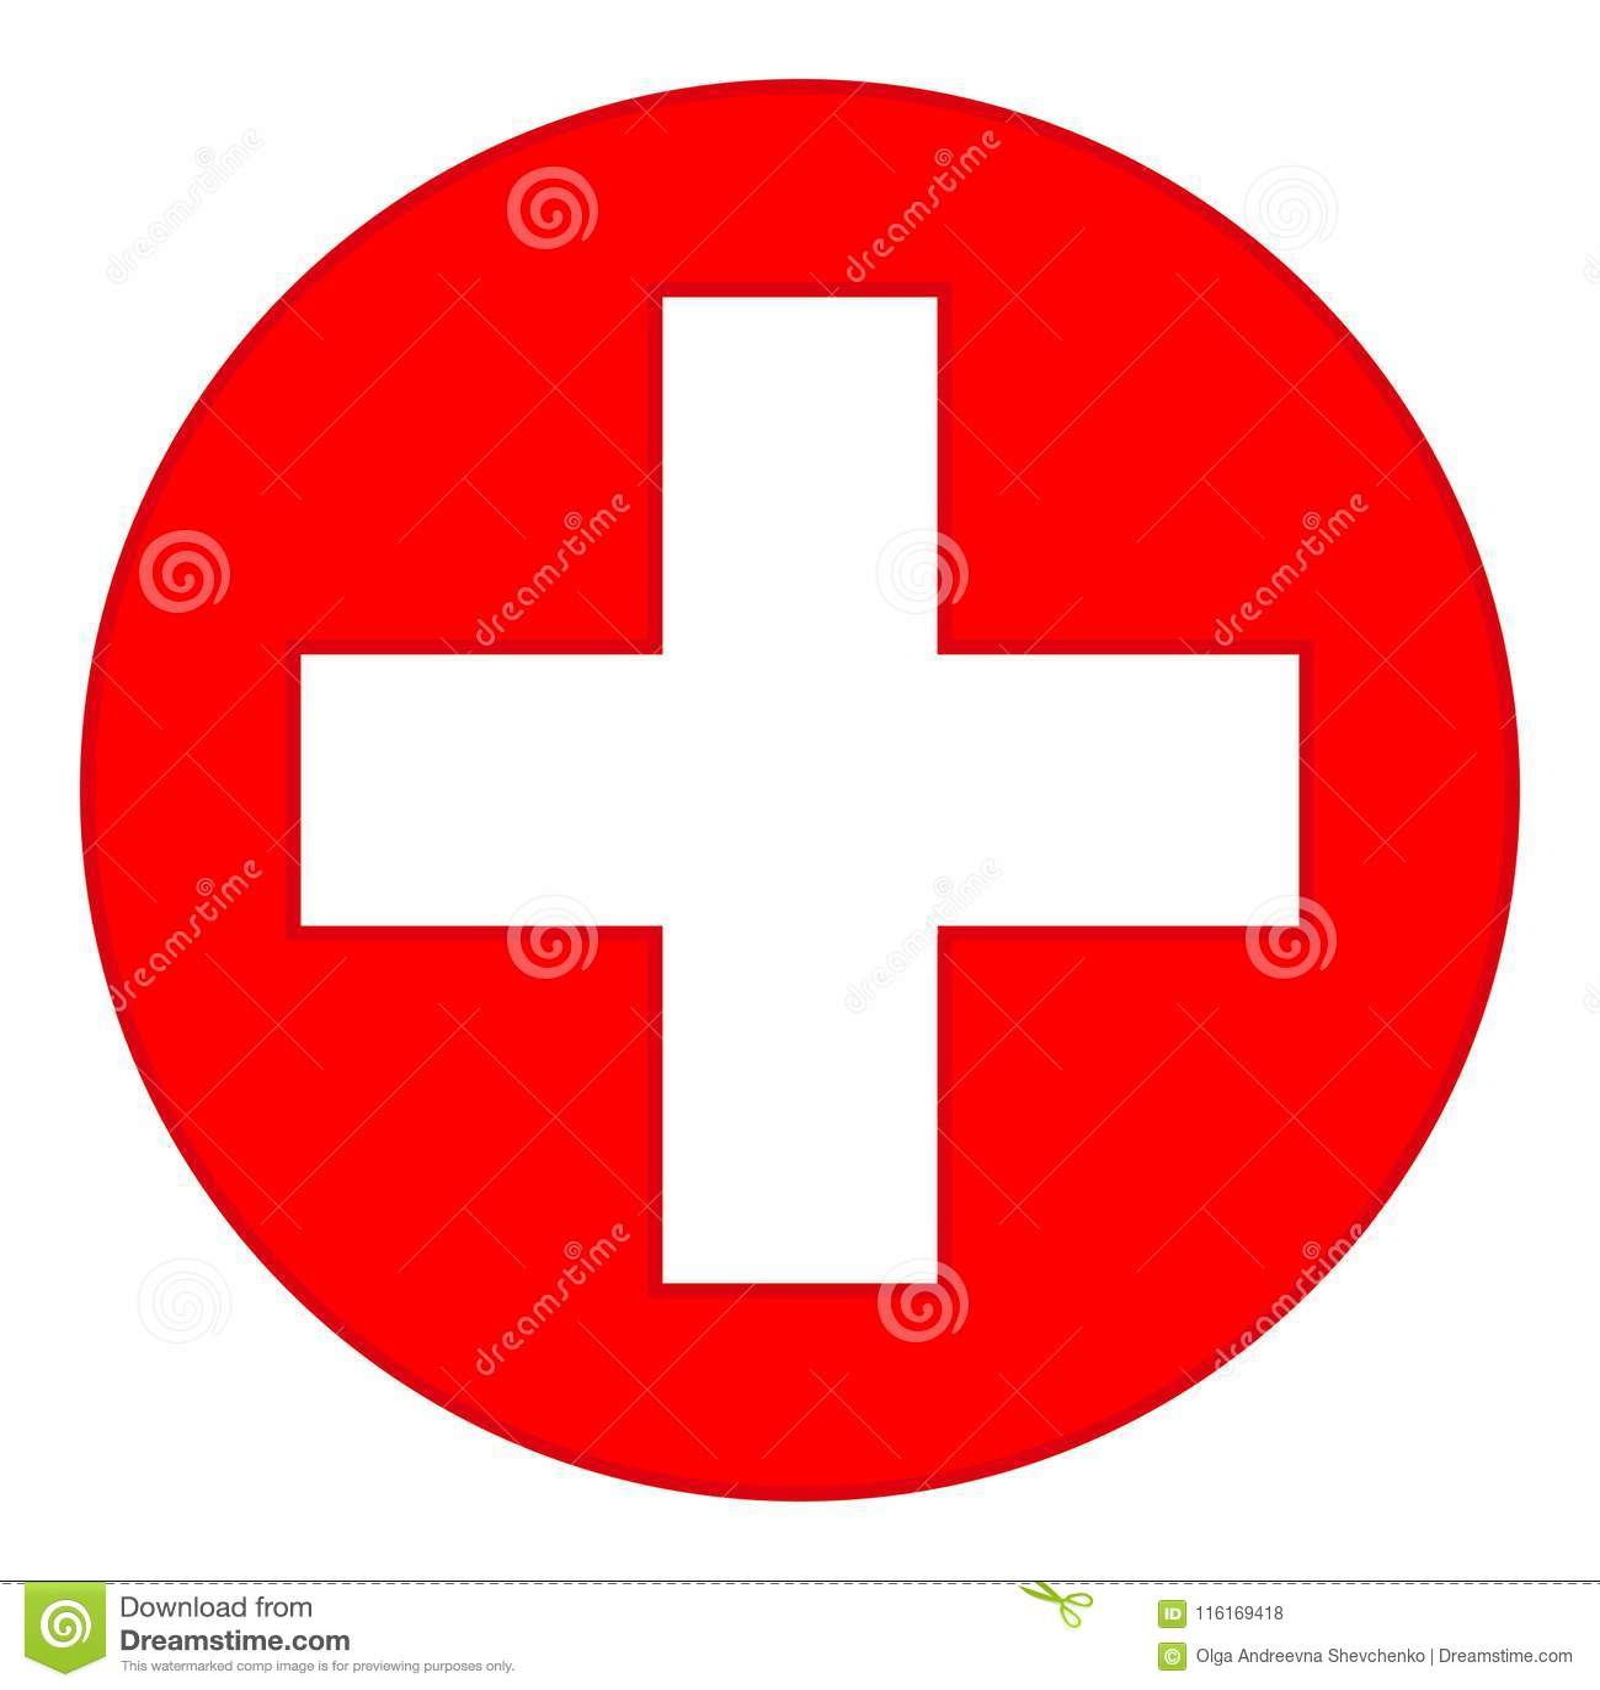 colorful red medical cross symbol stock illustration - illustration of cross,  healthcare: 116169418  dreamstime.com